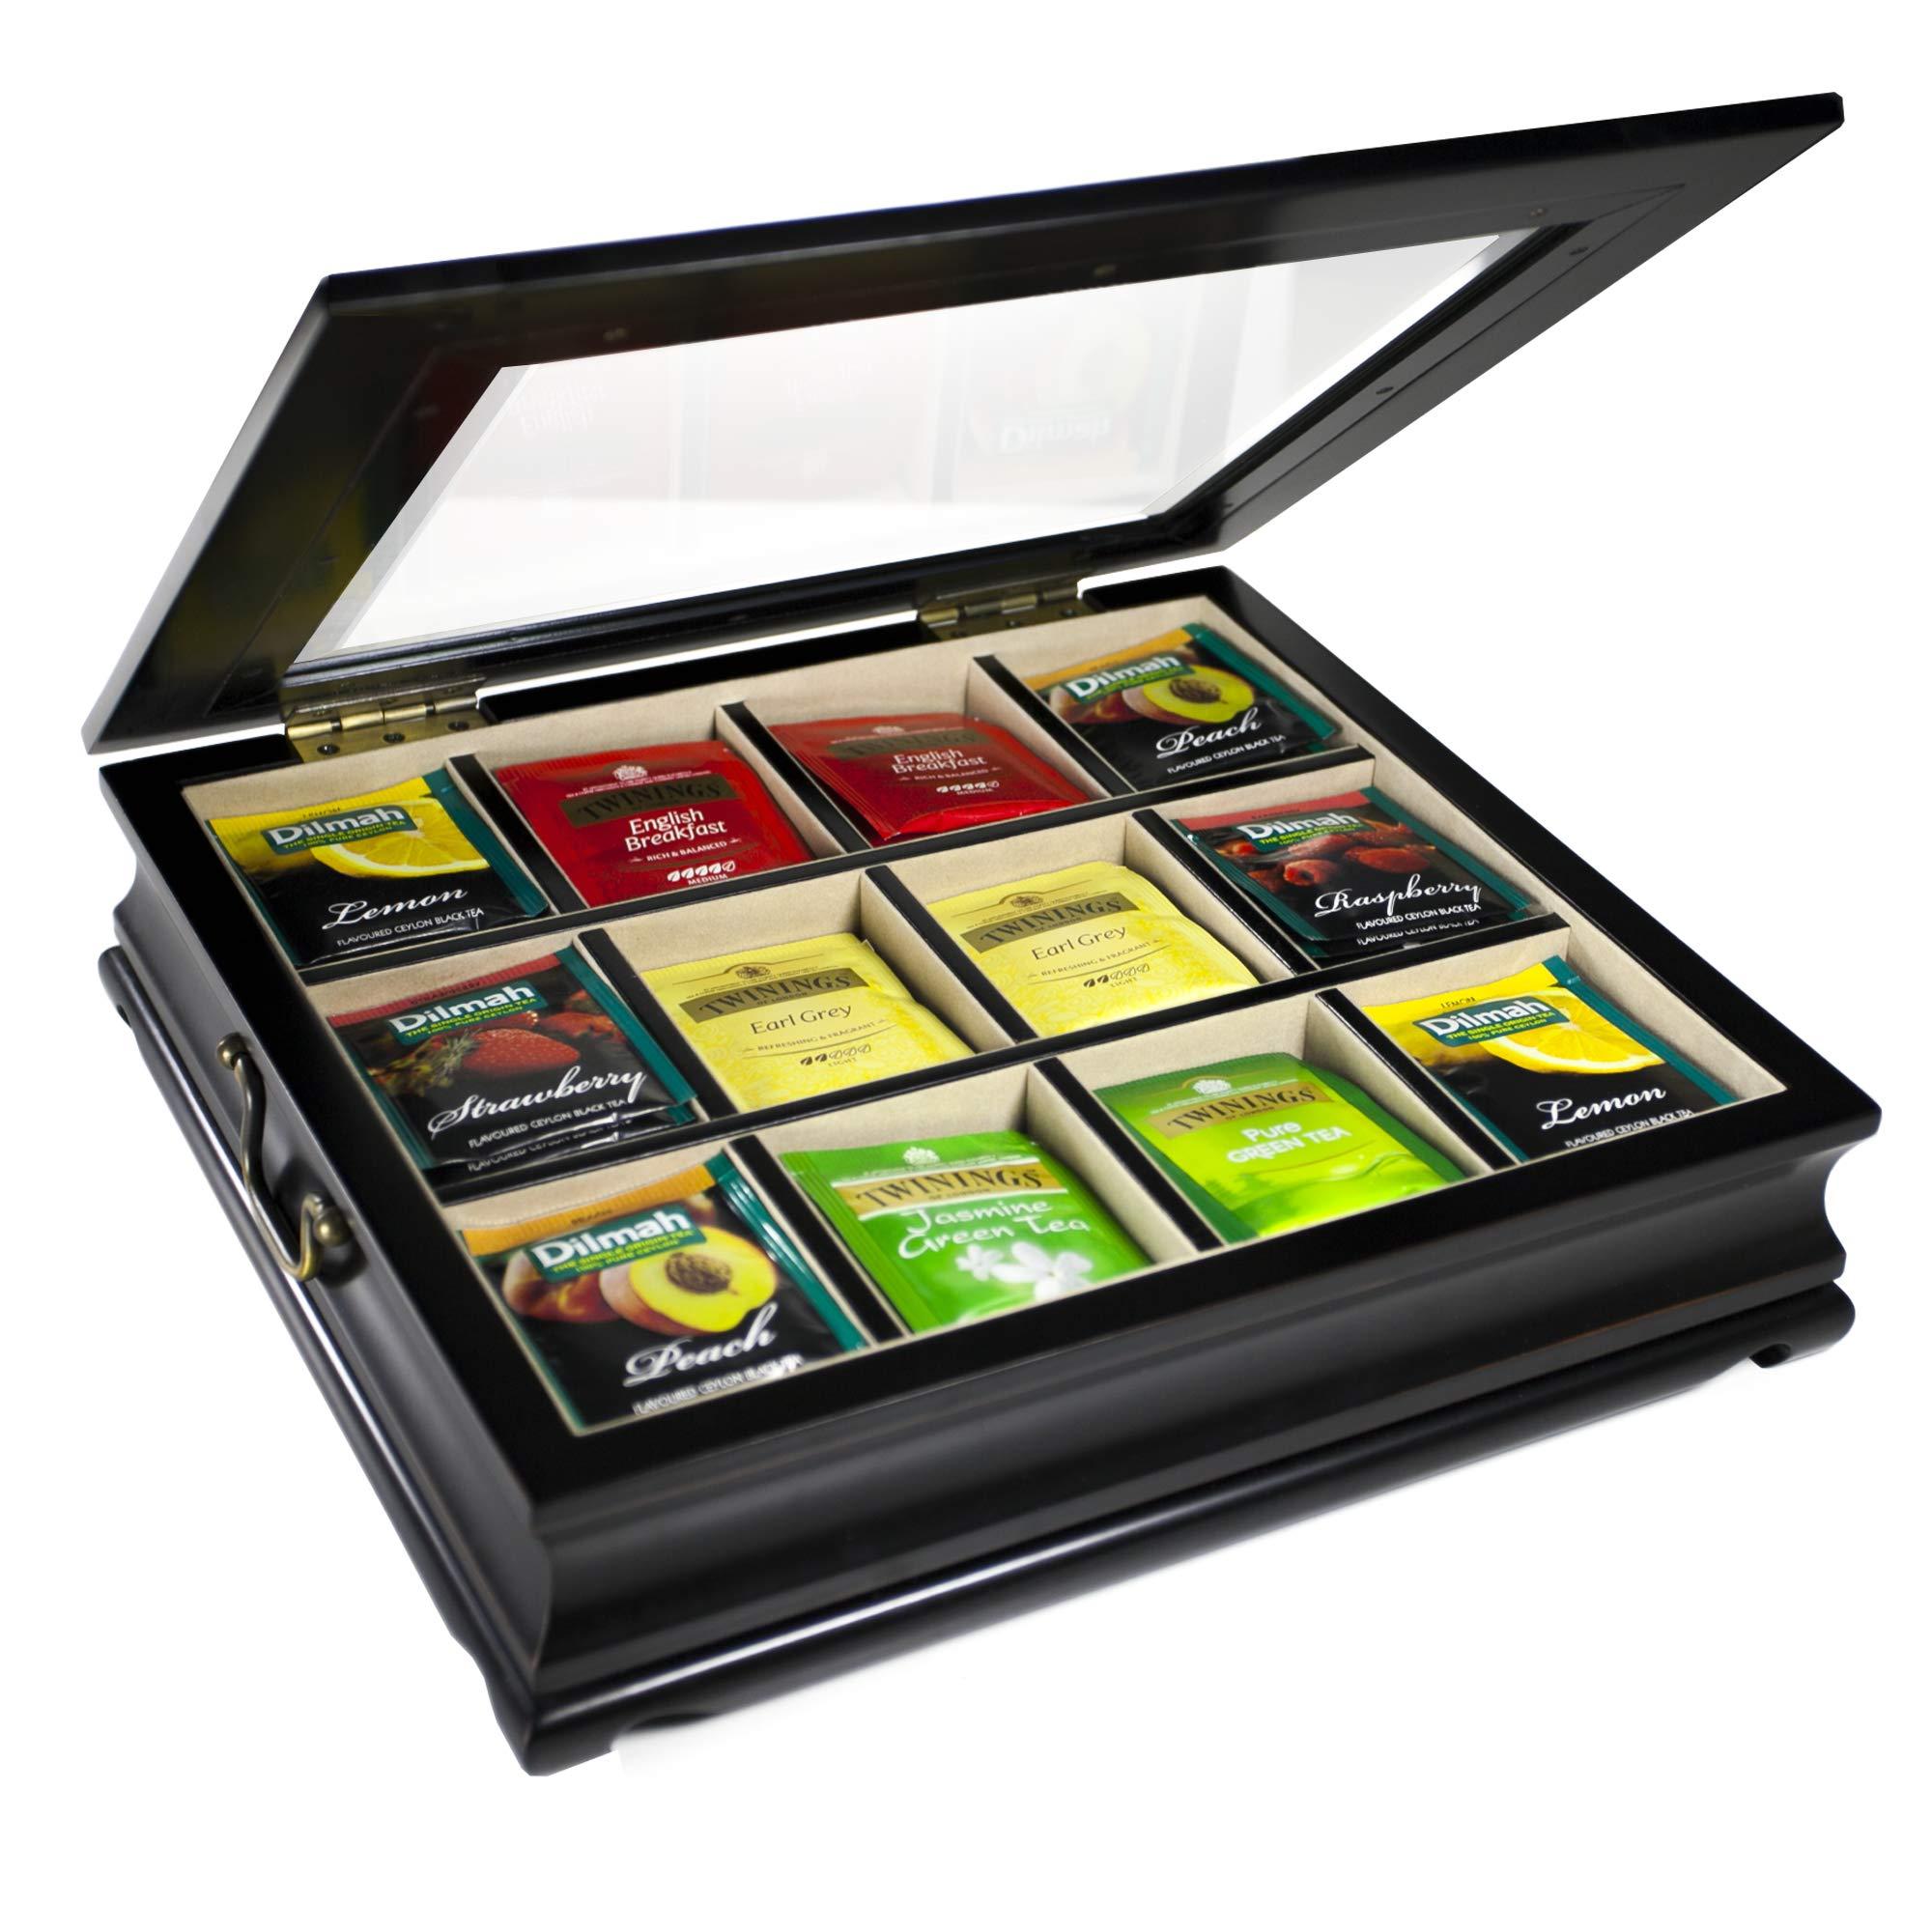 ChezMonett Tea Chest Large Storage Tea Bag Box Wooden with Beveled Glass Window 12 Compartments by ChezMonett